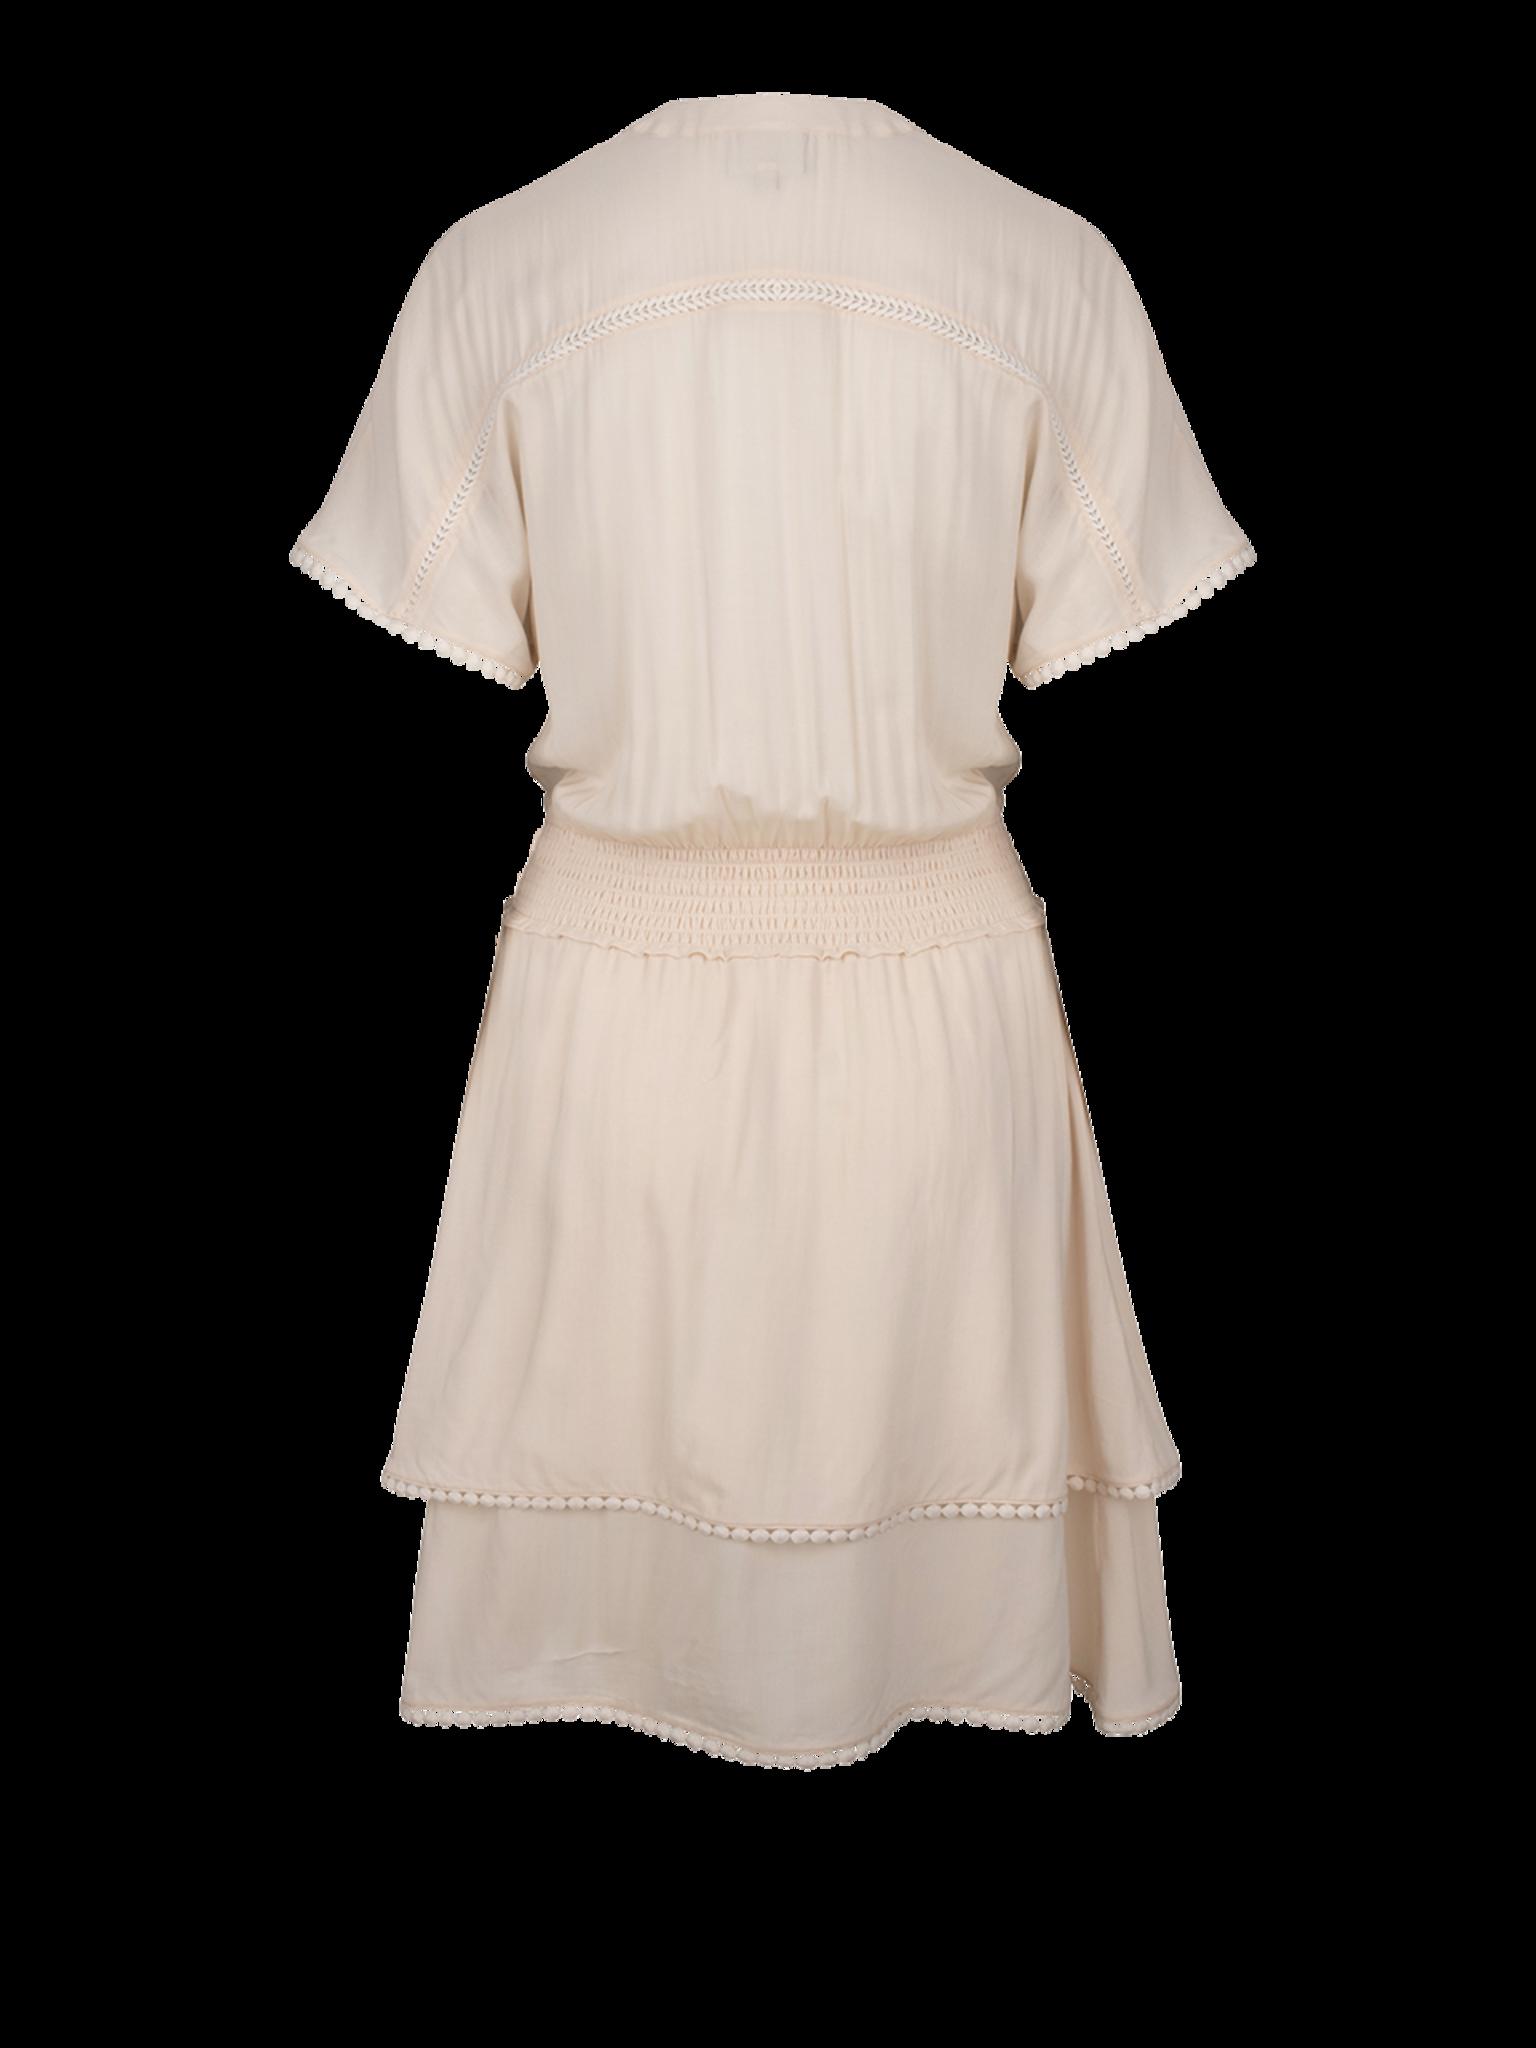 Dante 6 Dress 211105 LEISURE-2